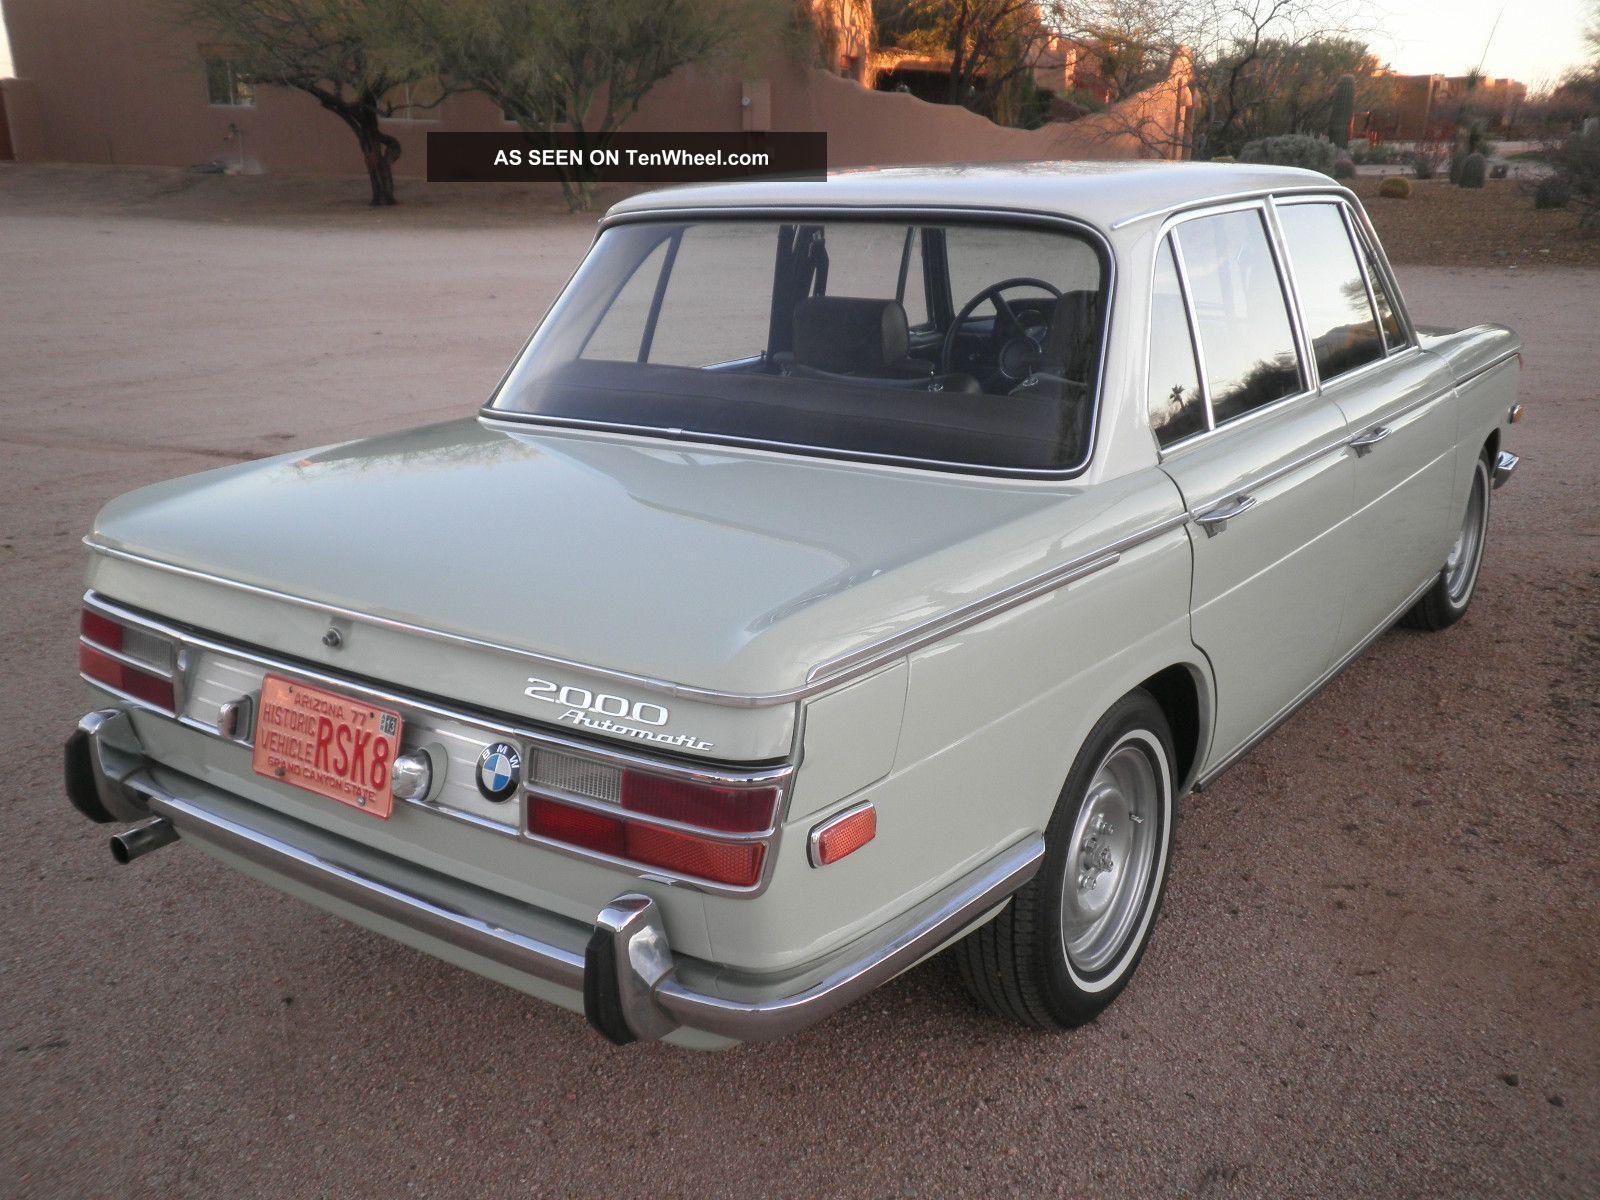 Gorgeous And Rare - Classic 1969 Bmw 2000 Sedan,  Rust Az Car Other photo